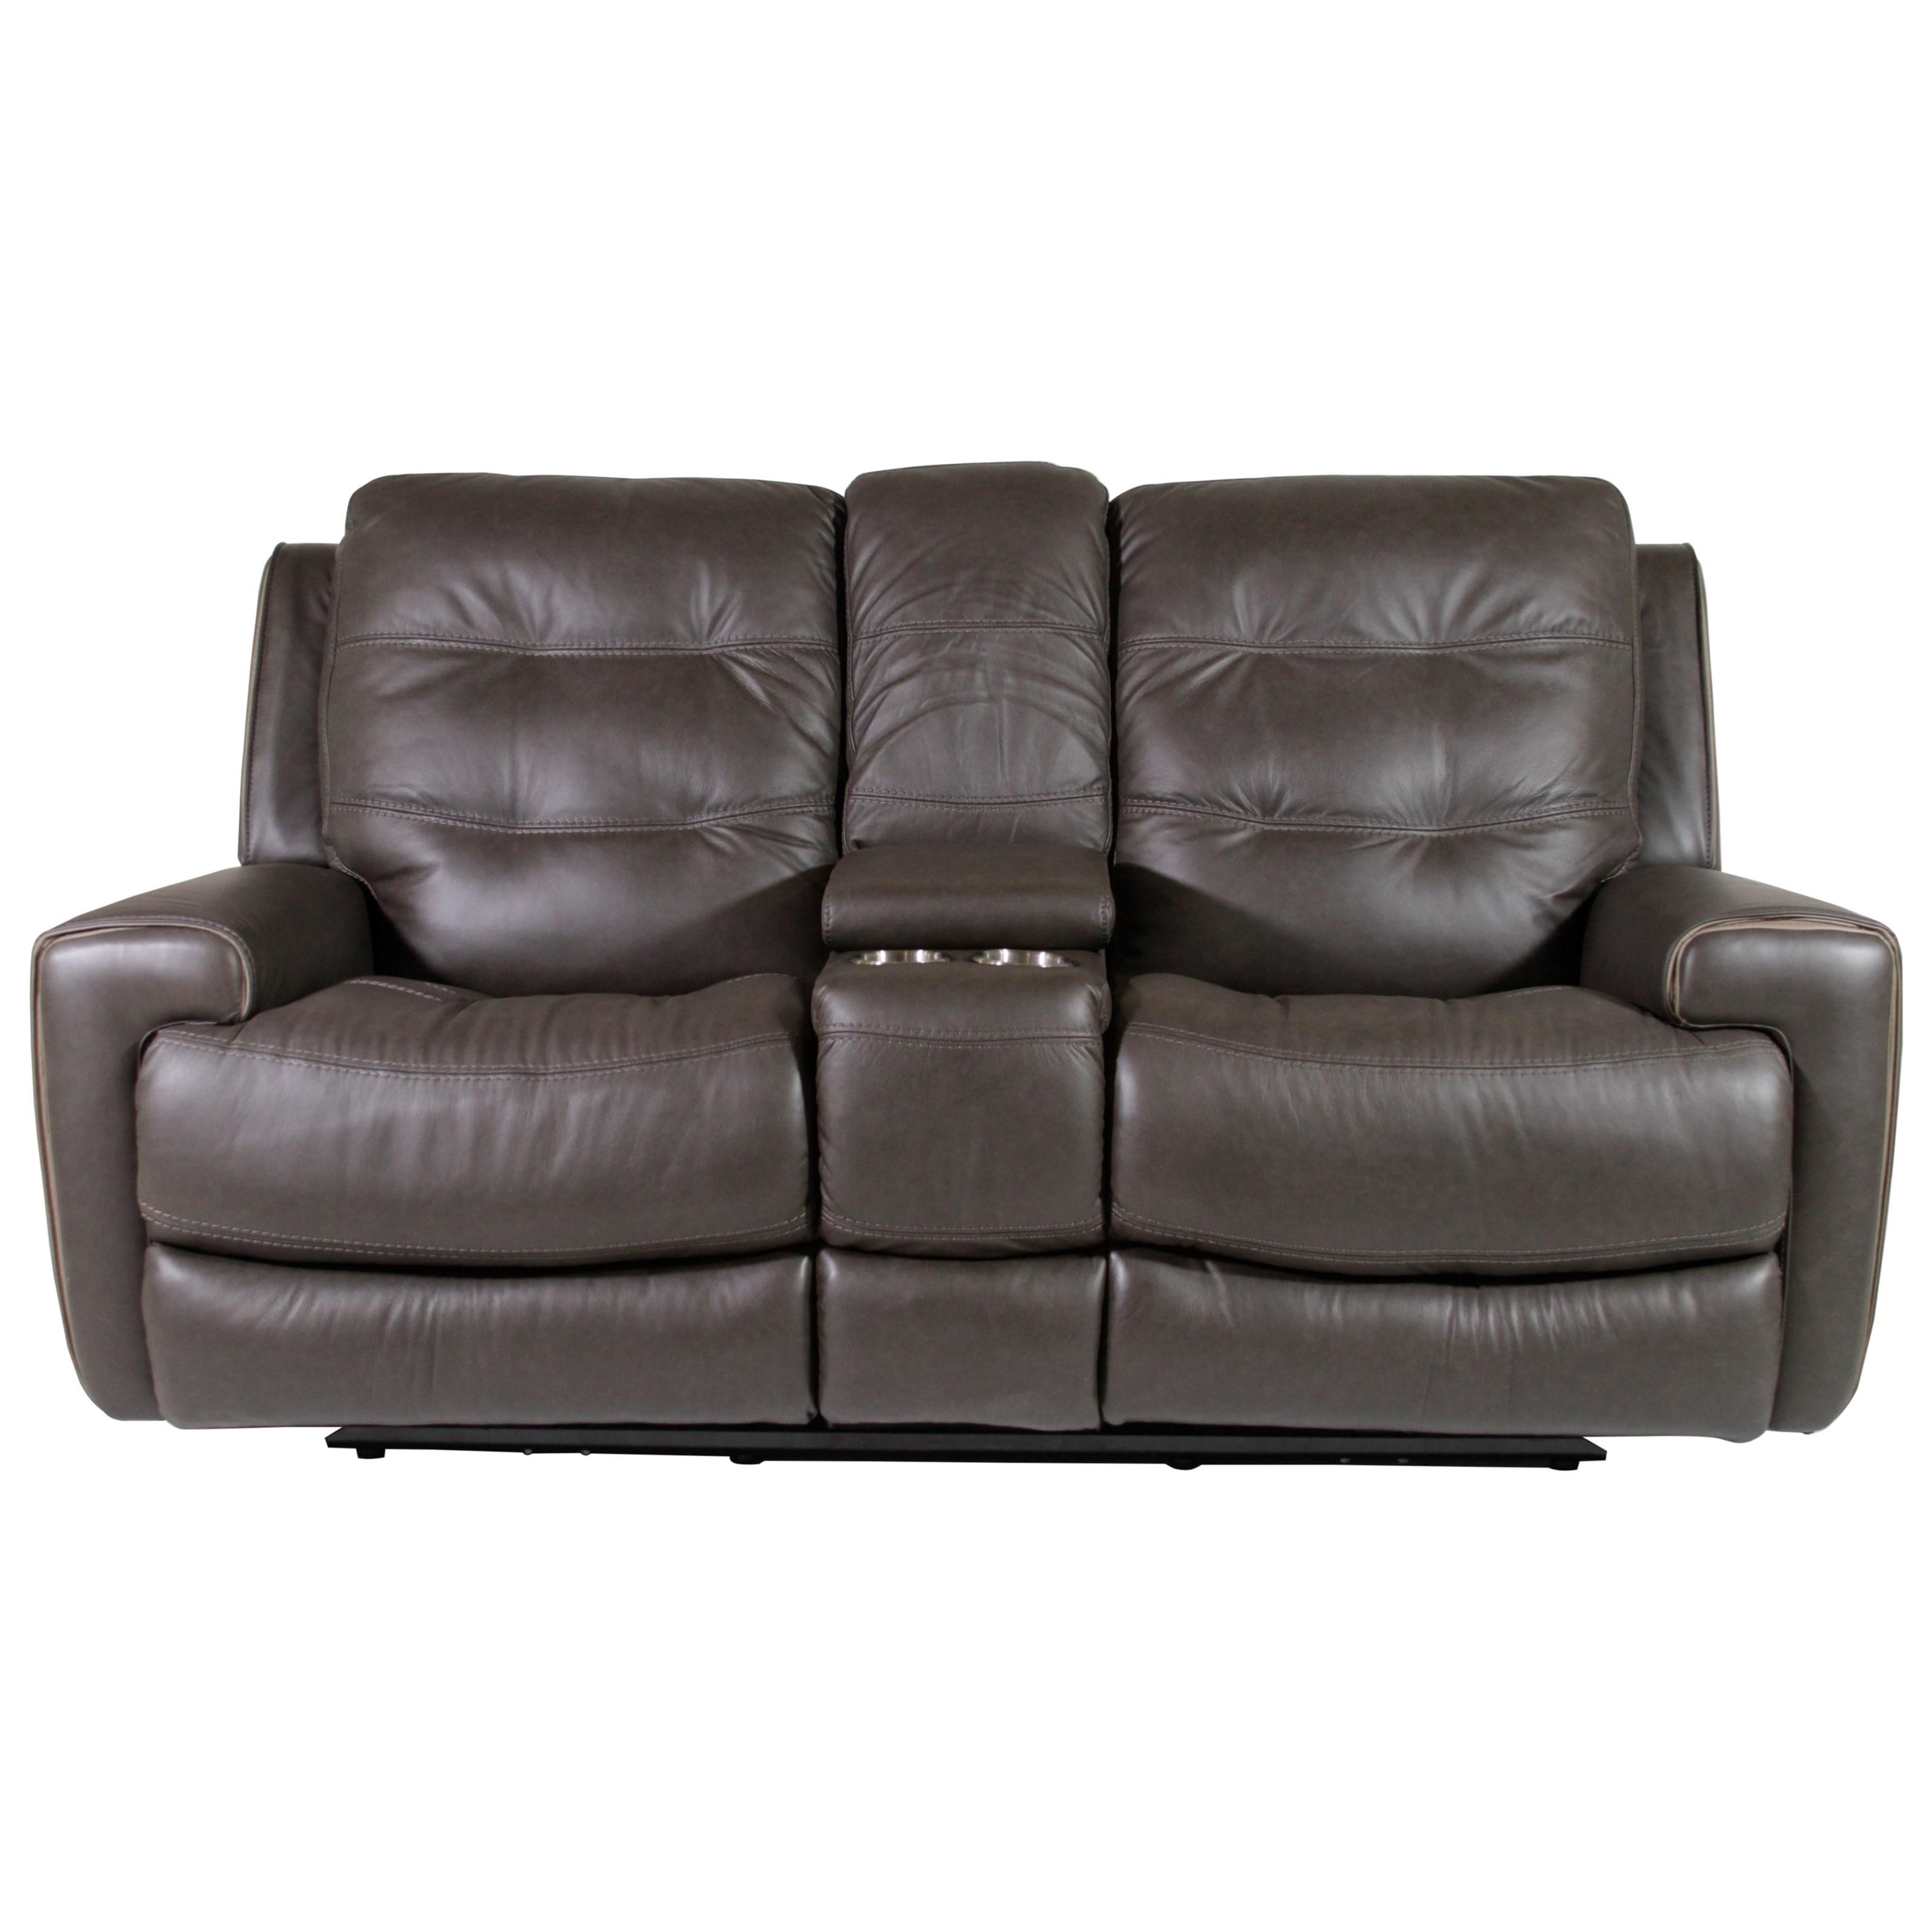 Latitudes-Wicklow Power Reclining Loveseat with Power Headrest by Flexsteel at Walker's Furniture